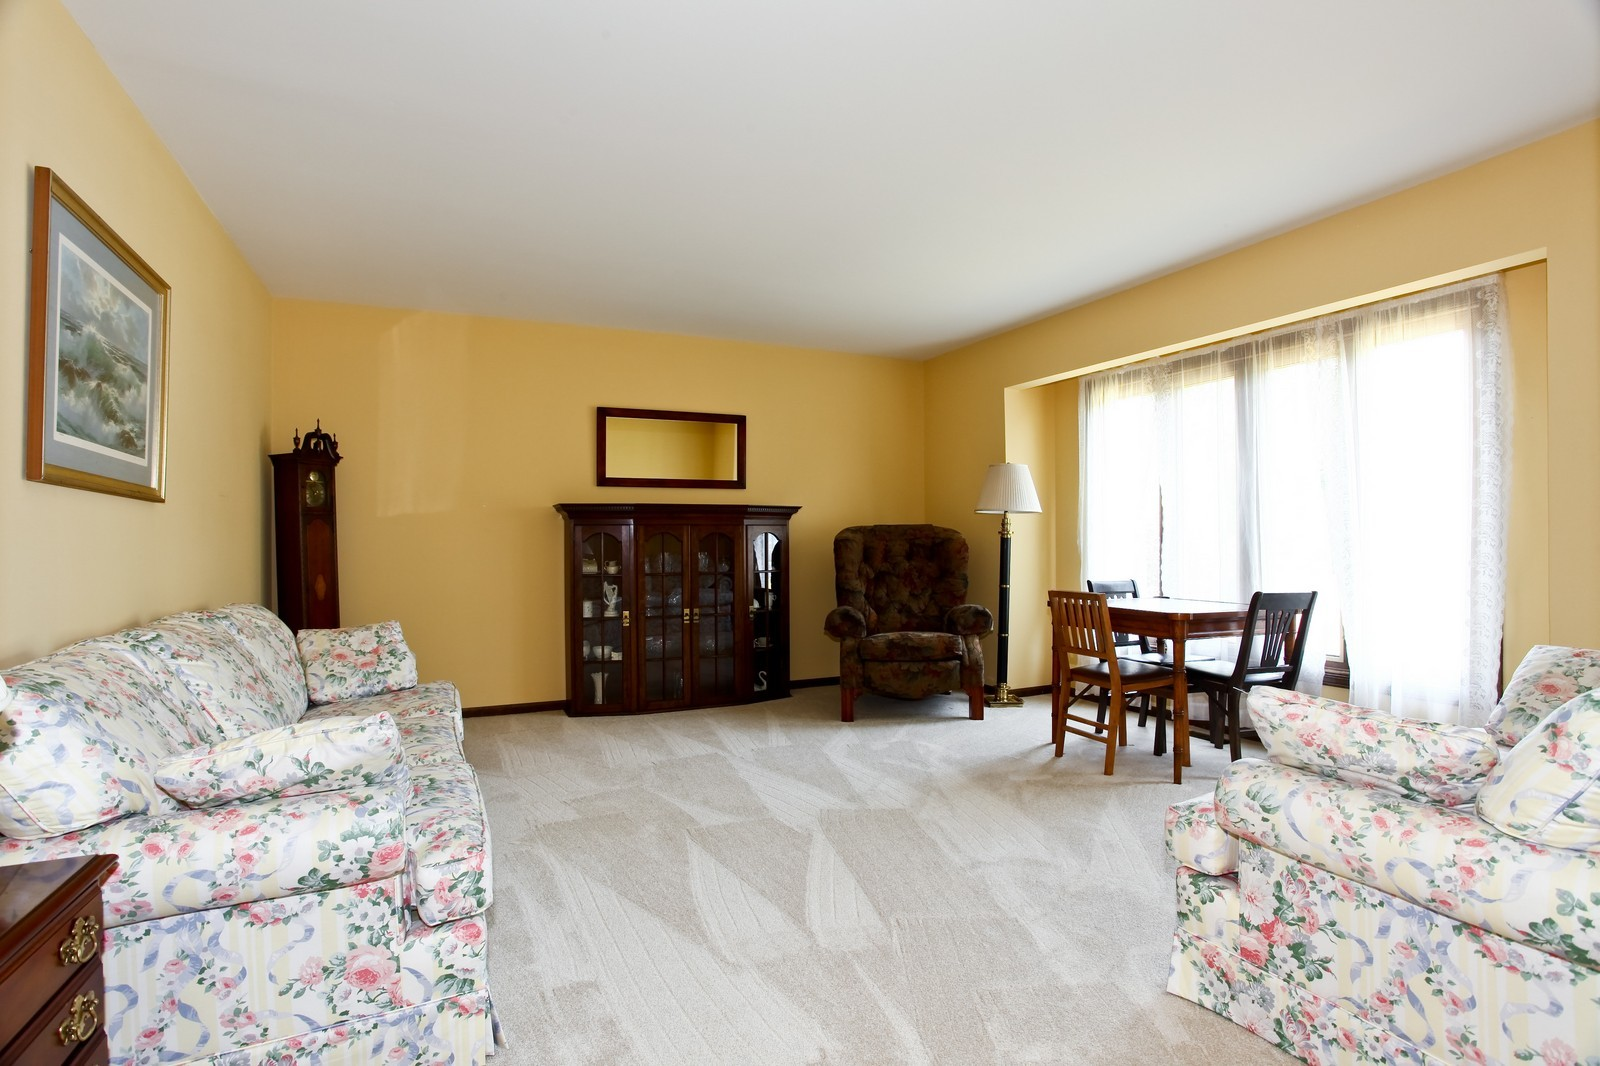 Real Estate Photography - 5N300 Sundance, Saint Charles, IL, 60175 - Living Room